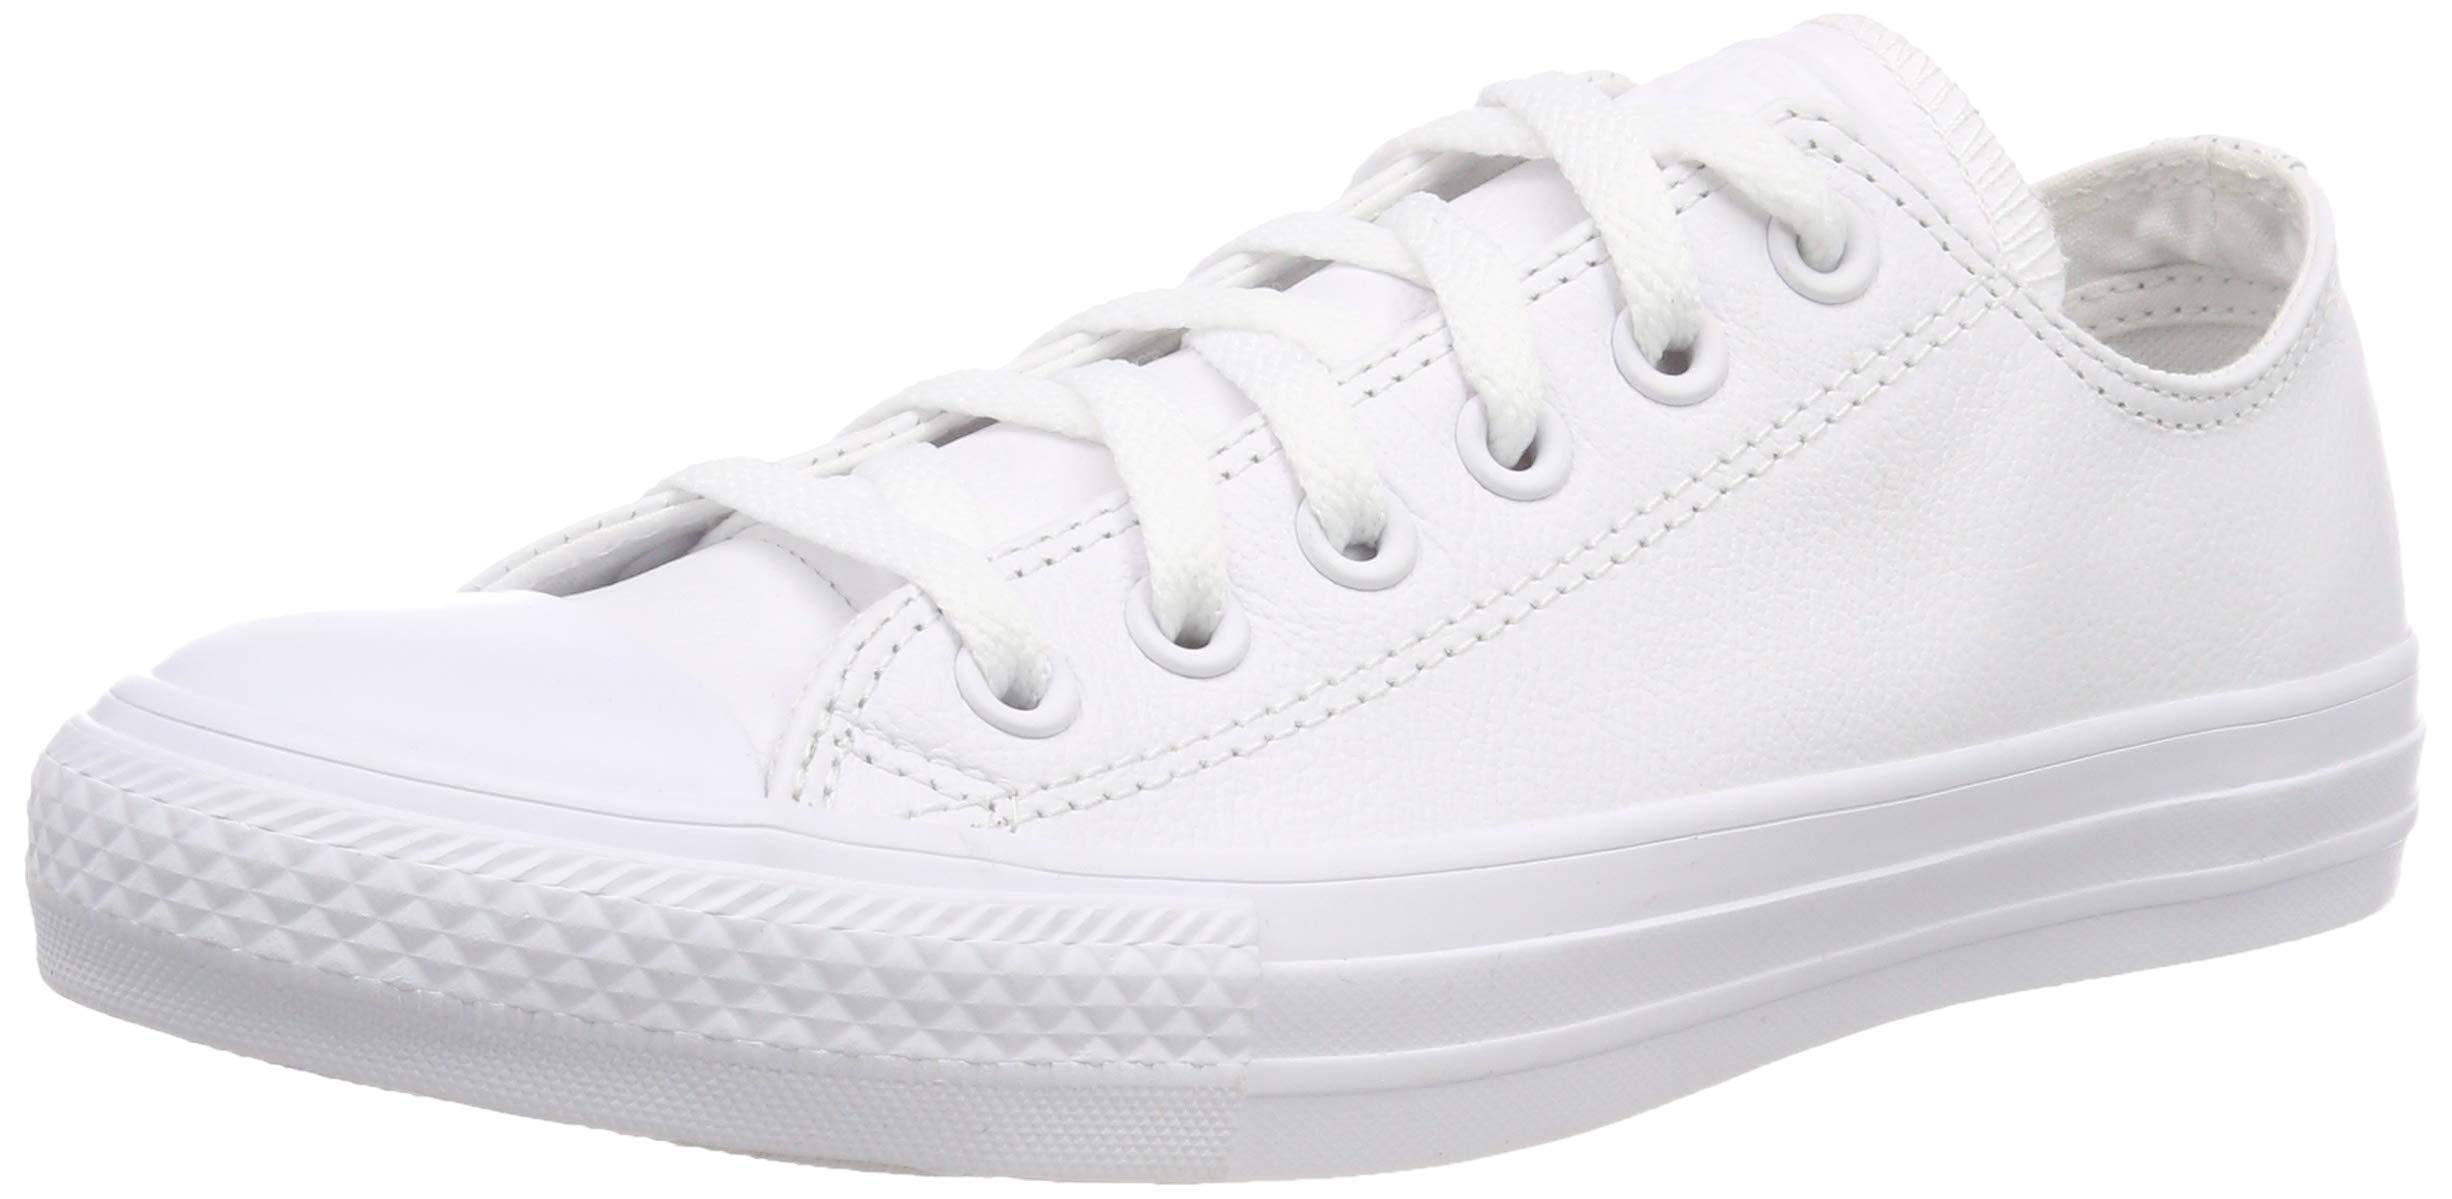 white converse amazon uk